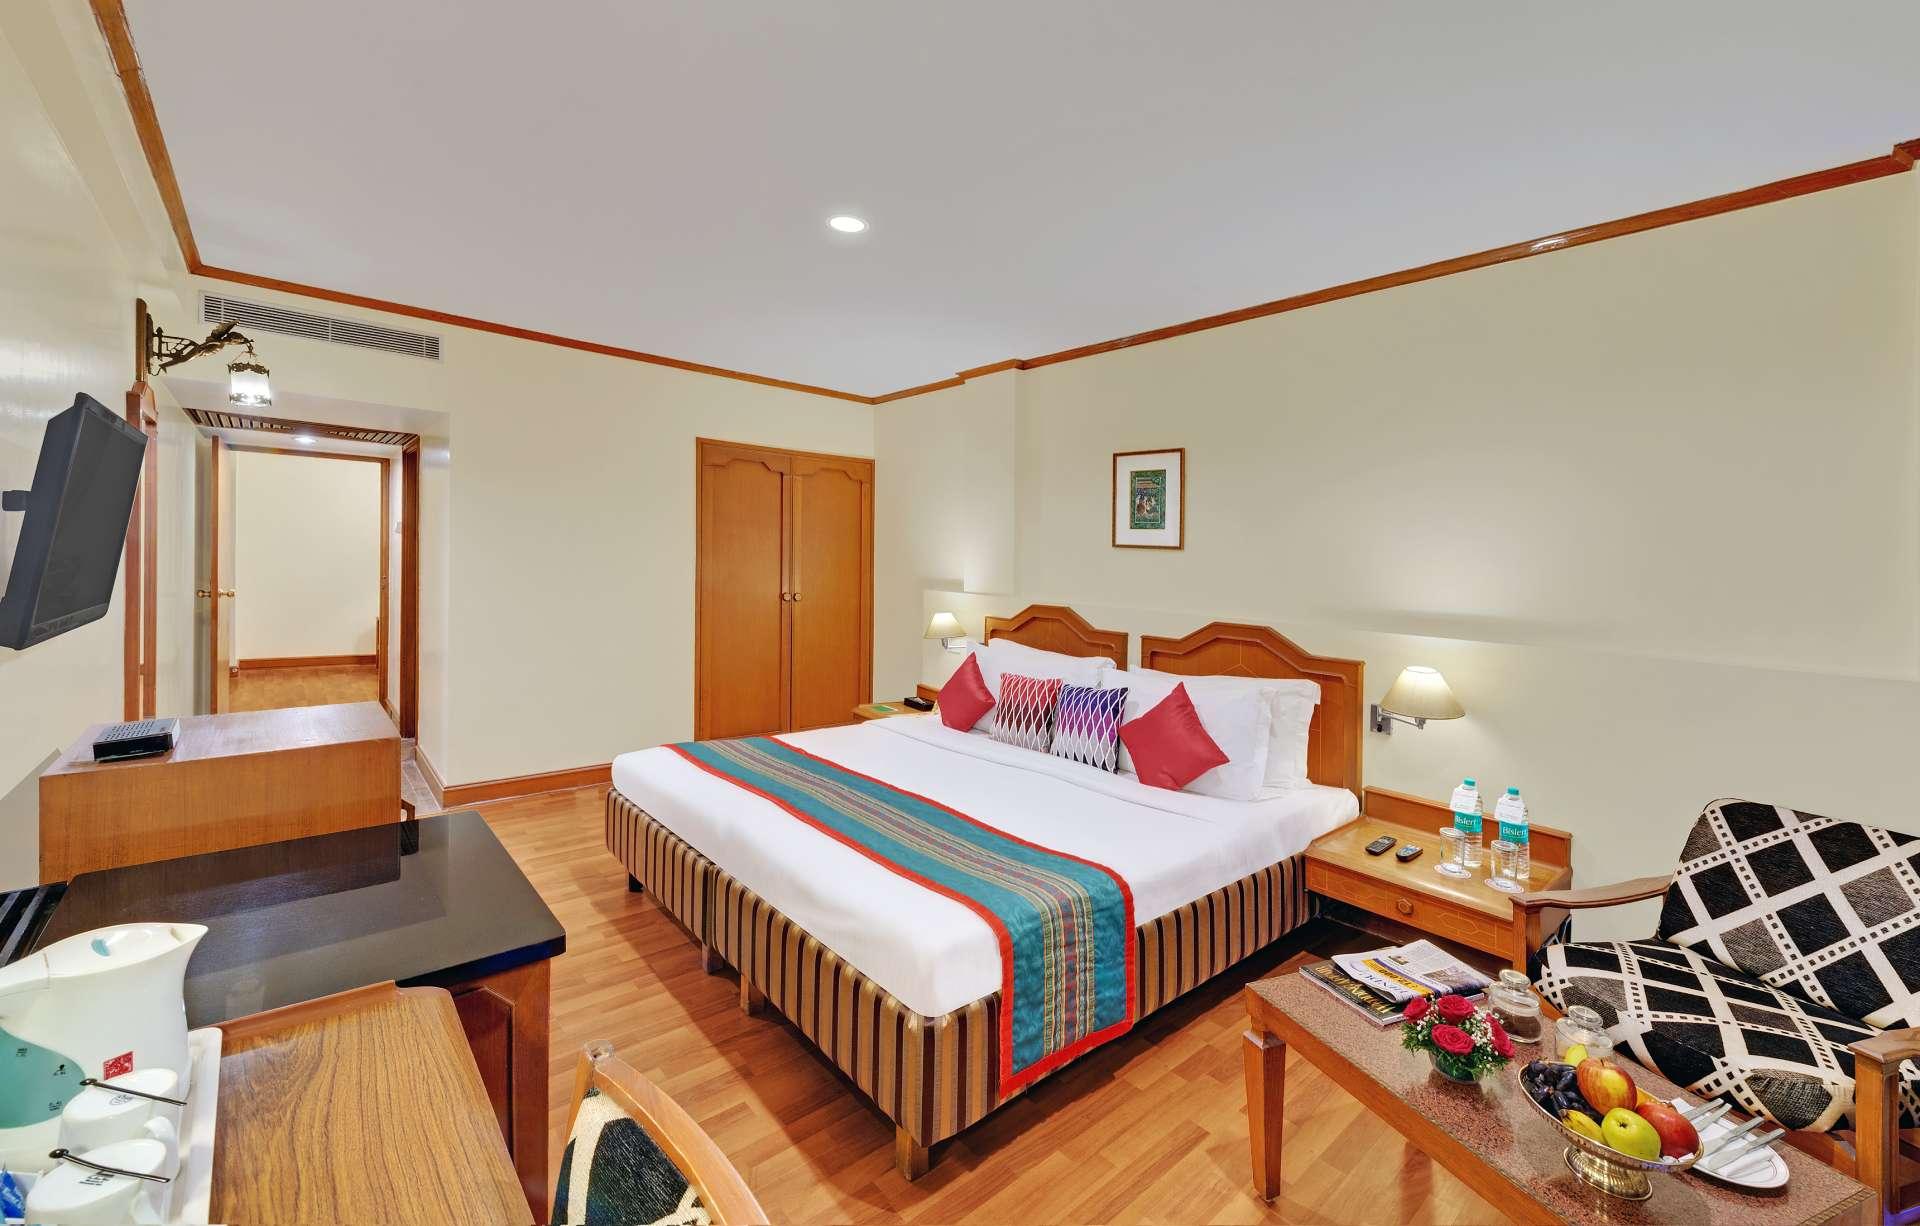 chennai executive suite ambassador pallava bed banner - The Ambassador | Heritage Hotels in Mumbai, Aurangabad, Chennai - Executive Suite